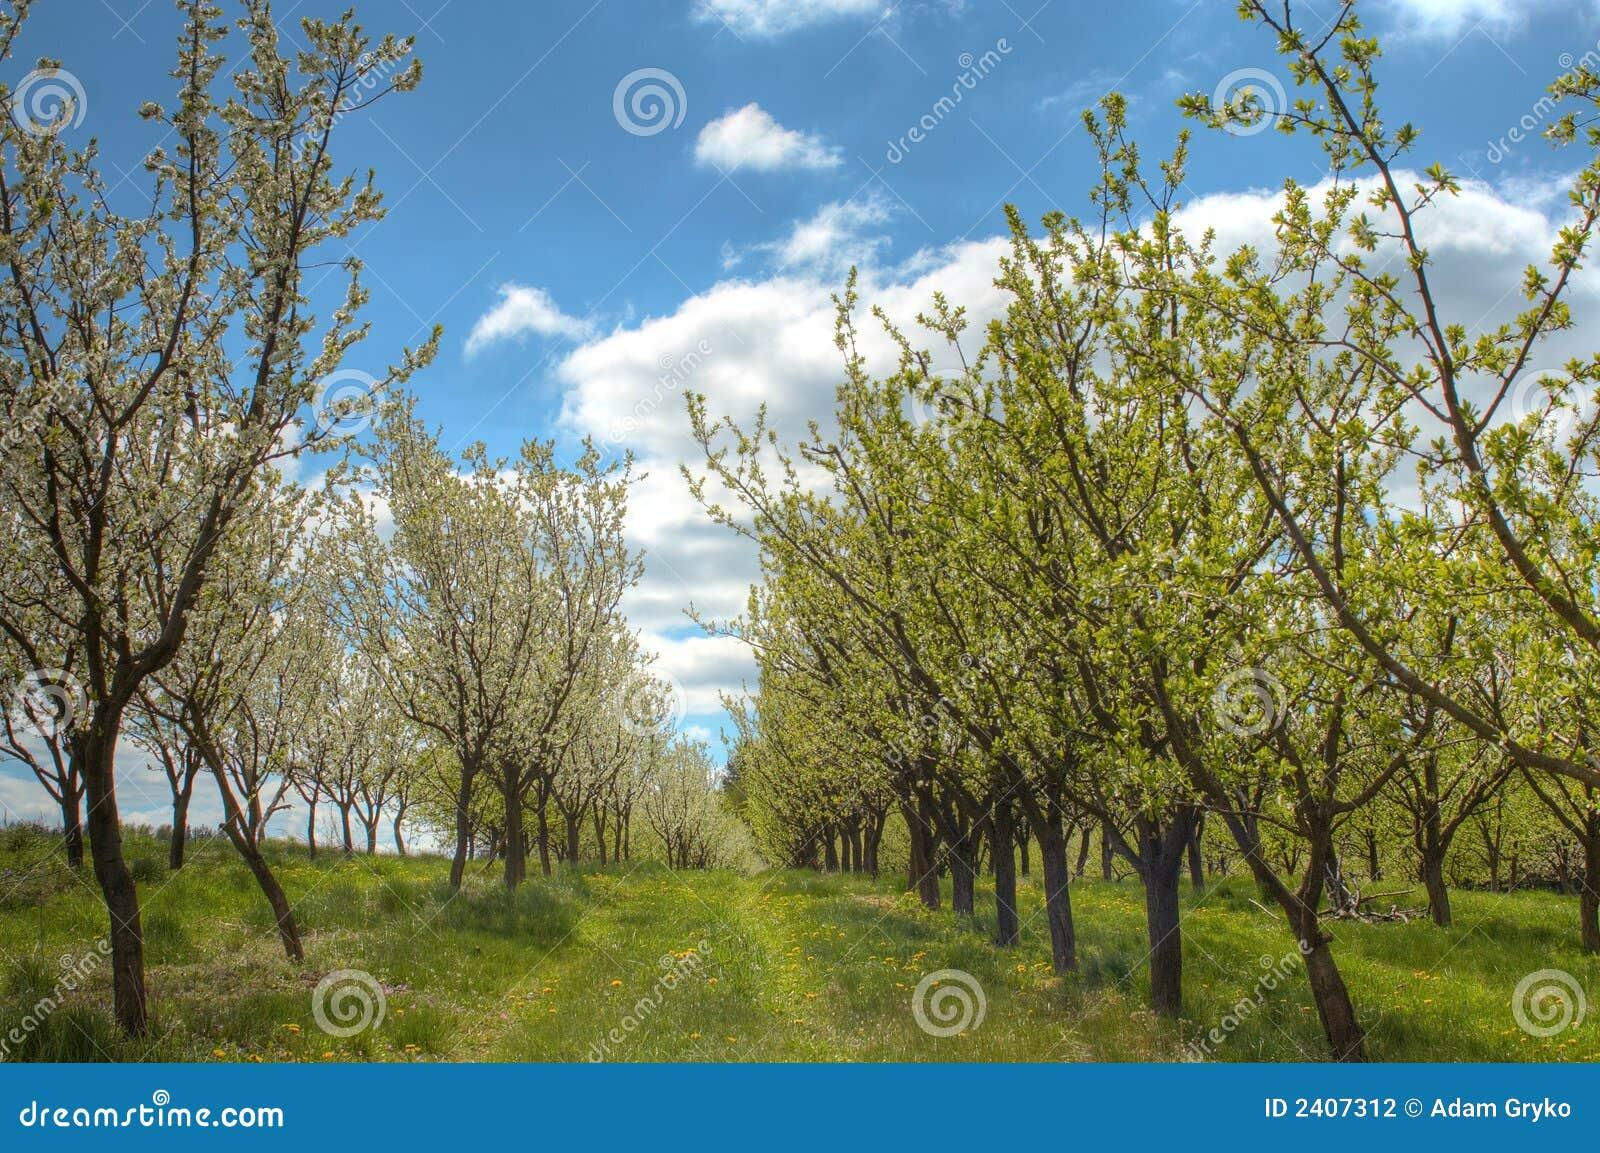 plum orchard stock photography image 2407312